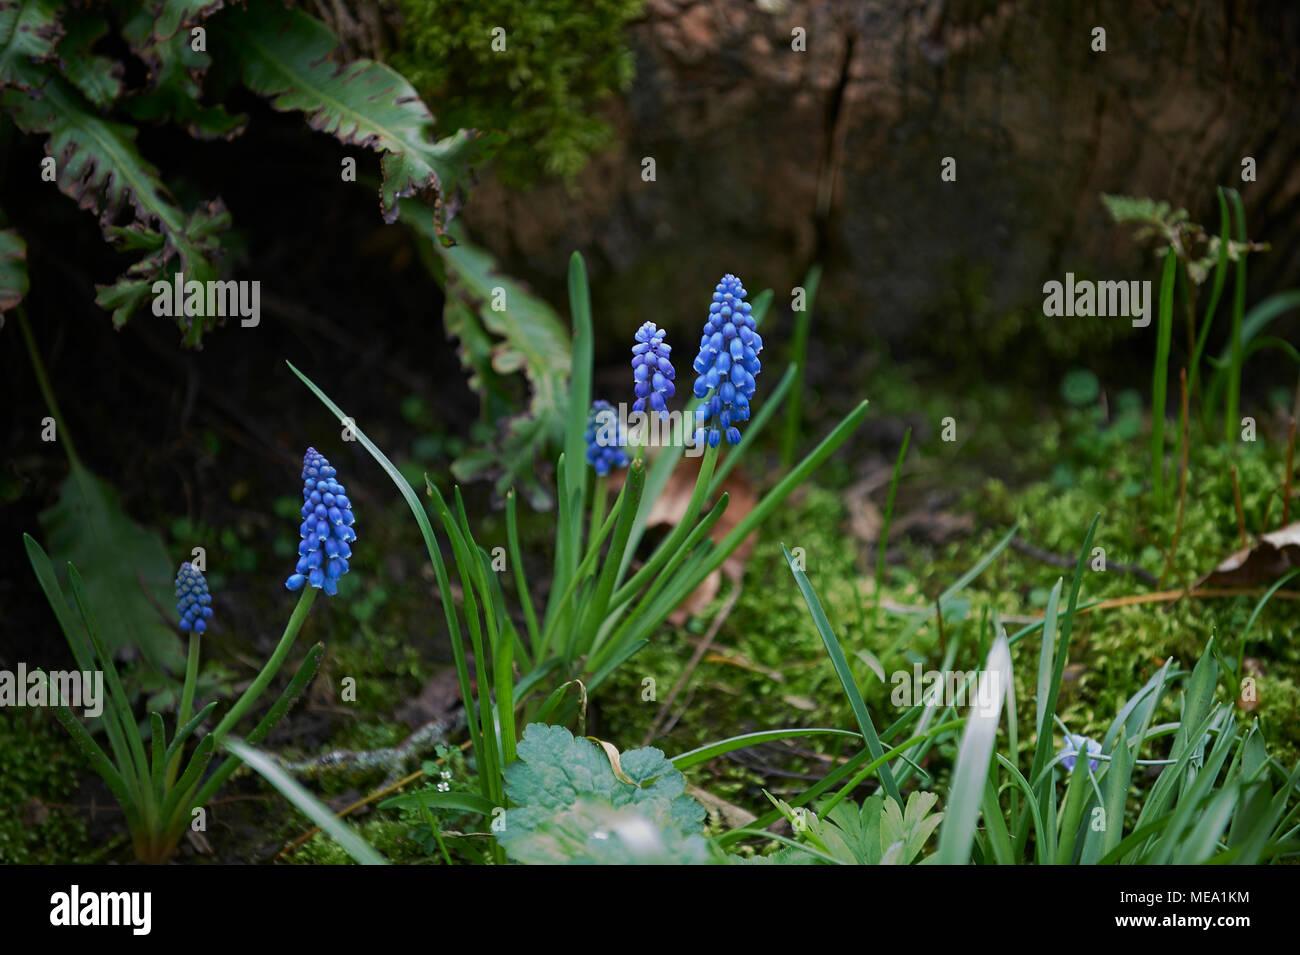 Grape Hyacinth (Muscari) growing in damp woodland. Stock Photo